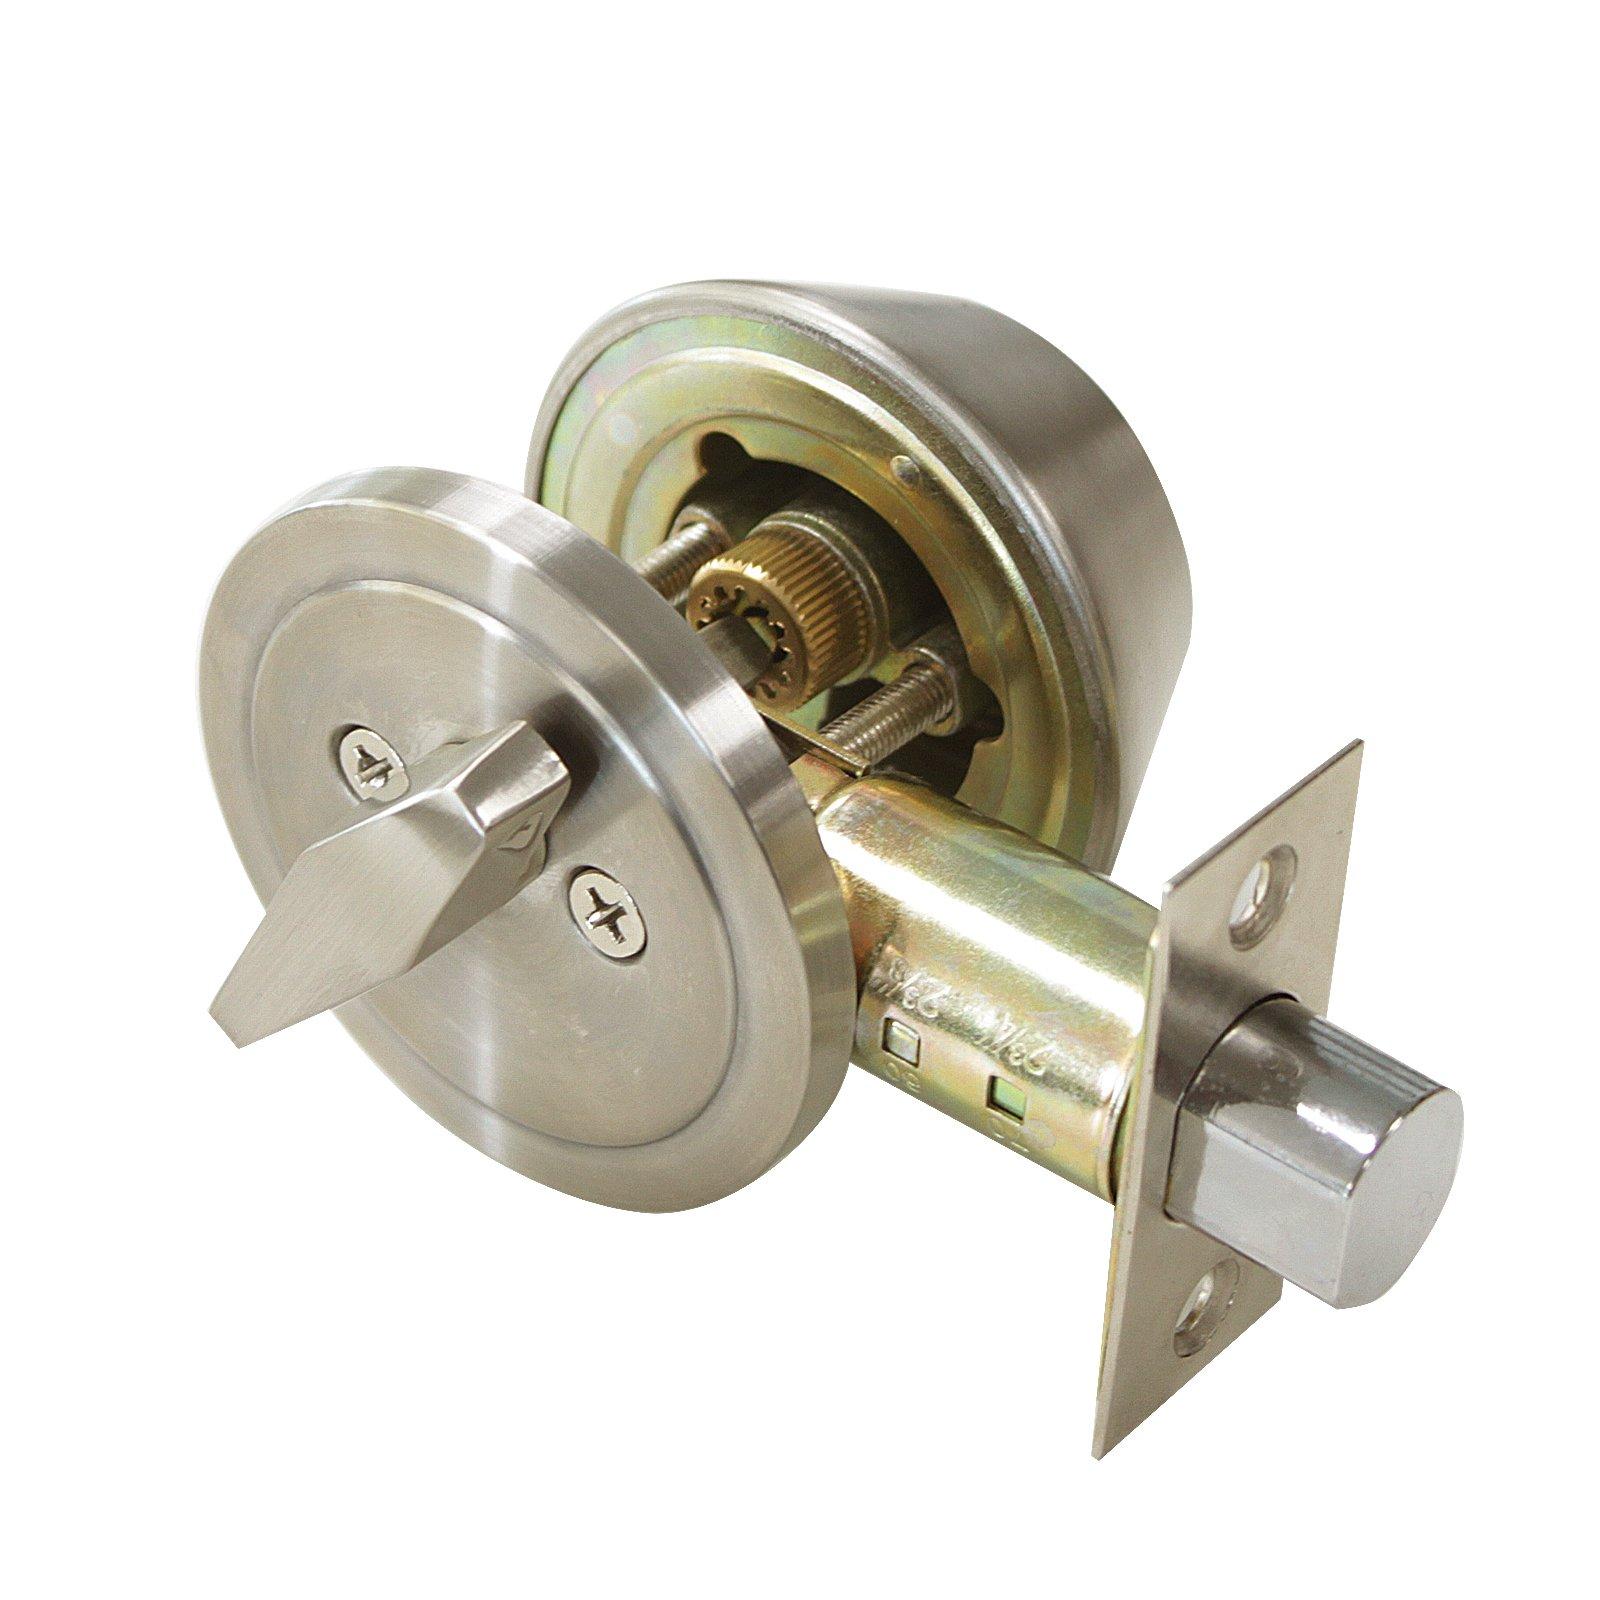 3 Pack Probrico Interior Bedroom Single Cylinder Deadbolt One Keyway Keyed Alike Same Key Safety Bolt Door Lock Lockset in Satin Nickel-Single Deadbolt-101 by Probrico (Image #2)